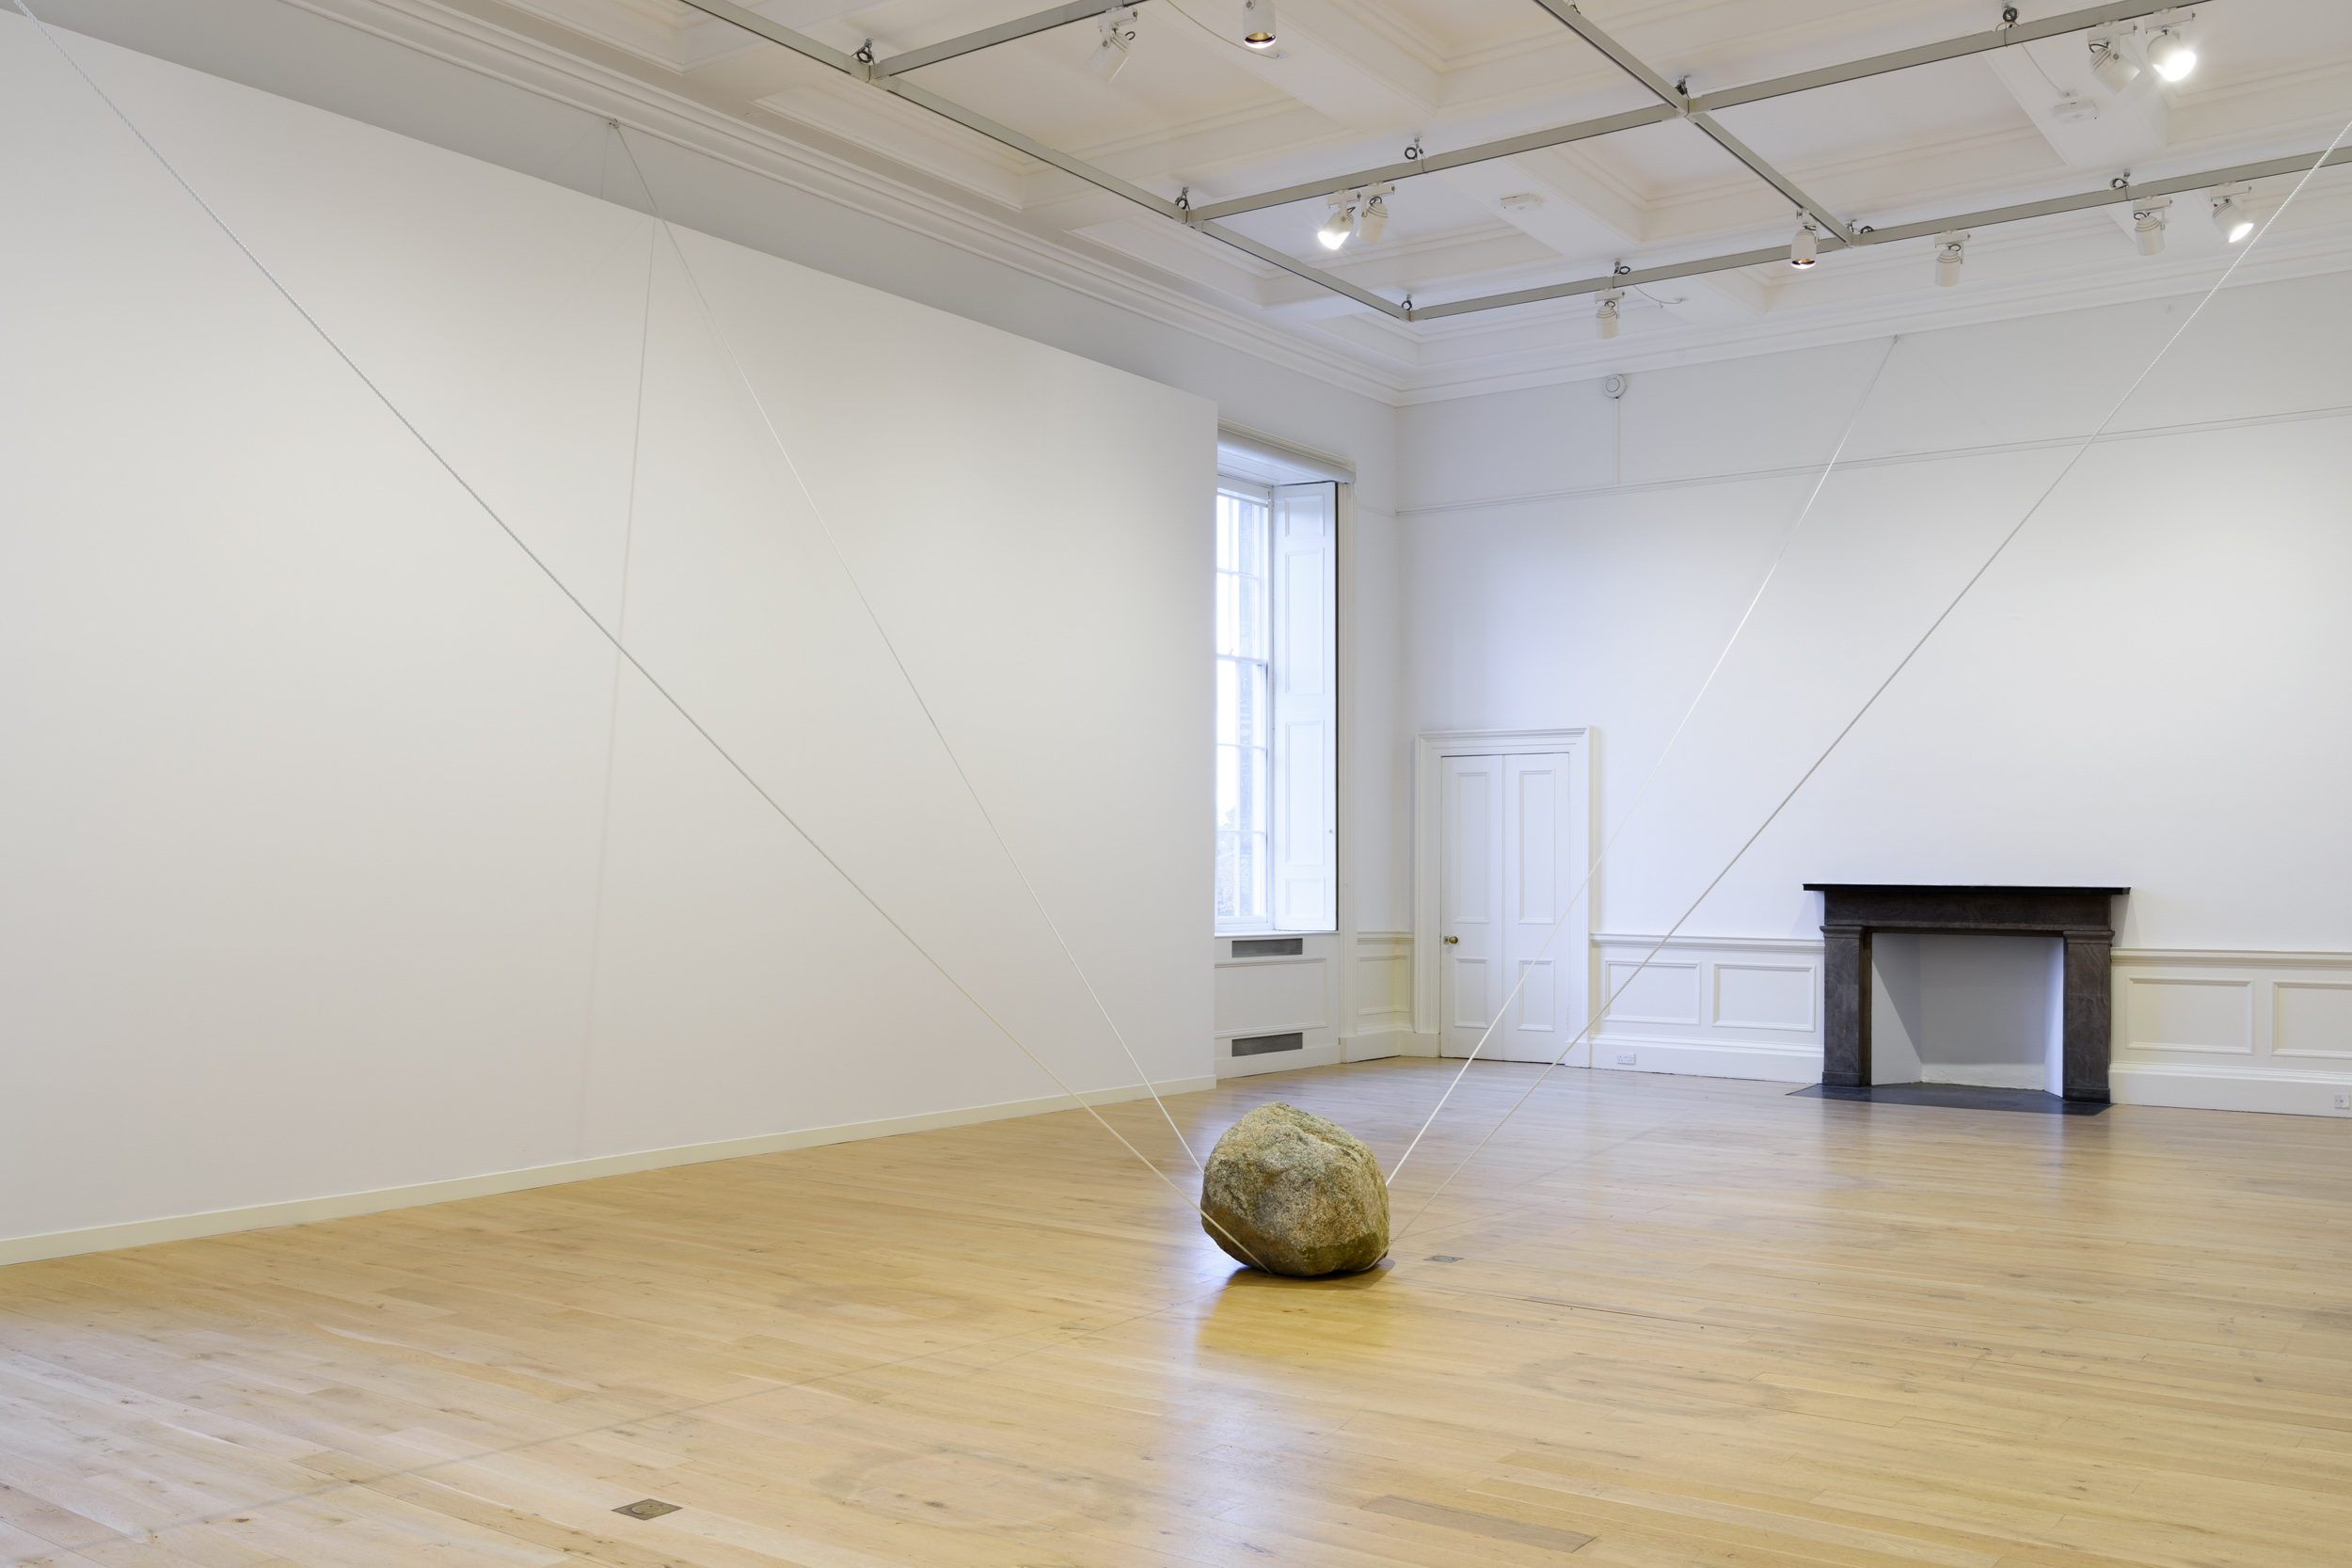 Interconnected Spaces , 2016 空連化 ( Kūrenka ) Stone, rope Dimensions variable Installation view, Karla Black and Kishio Suga:A New Order ,Scottish National Gallery of Modern Art, Edinburgh,2016 Photo: Sam Drake;Courtesy National Galleries of Scotland